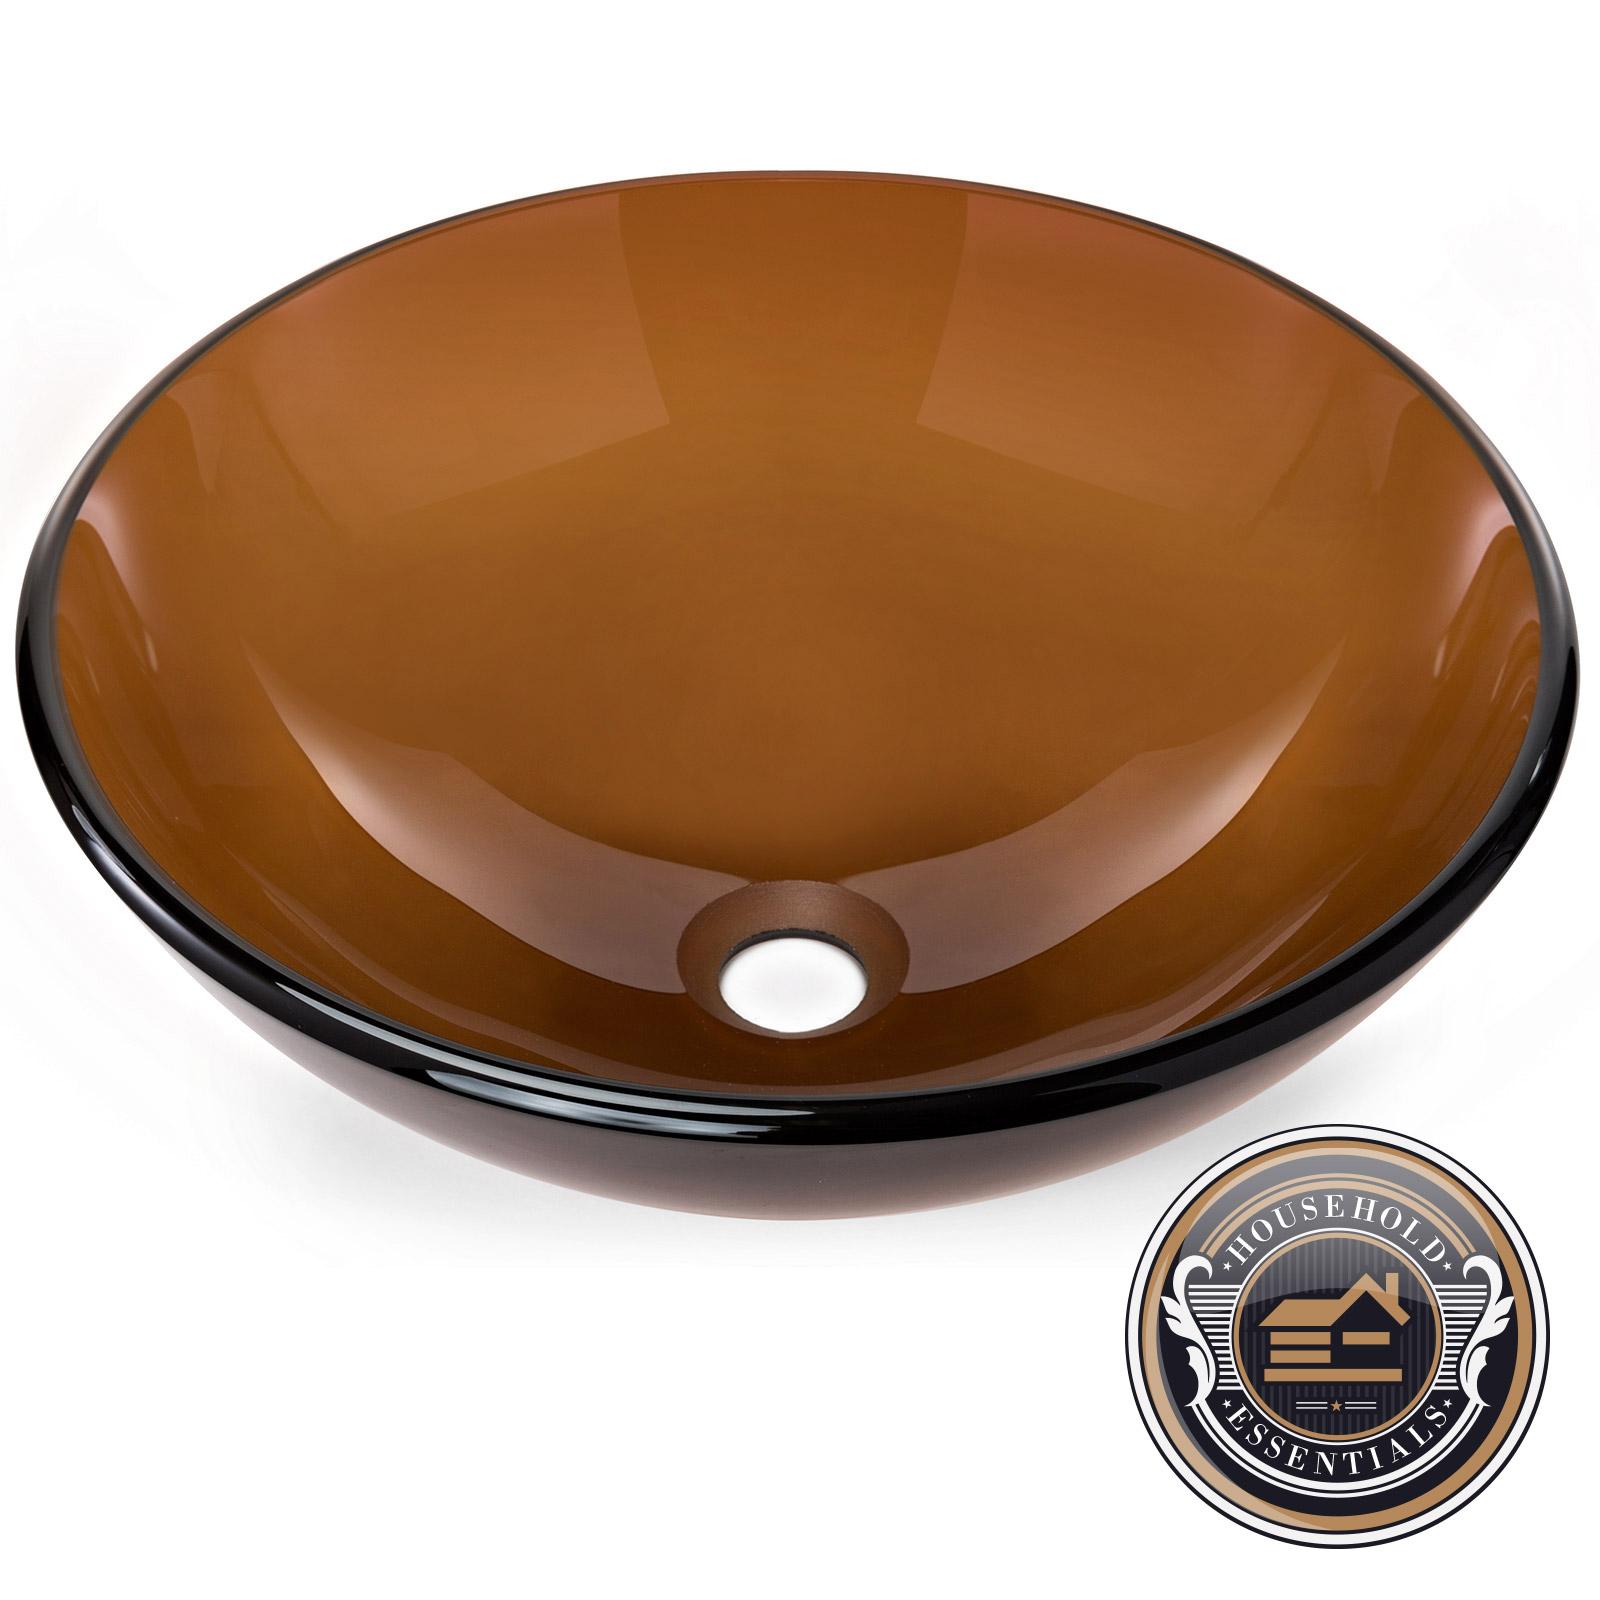 Bathroom Sinks Ebay tempered glass round vessel vanity bathroom sink | ebay